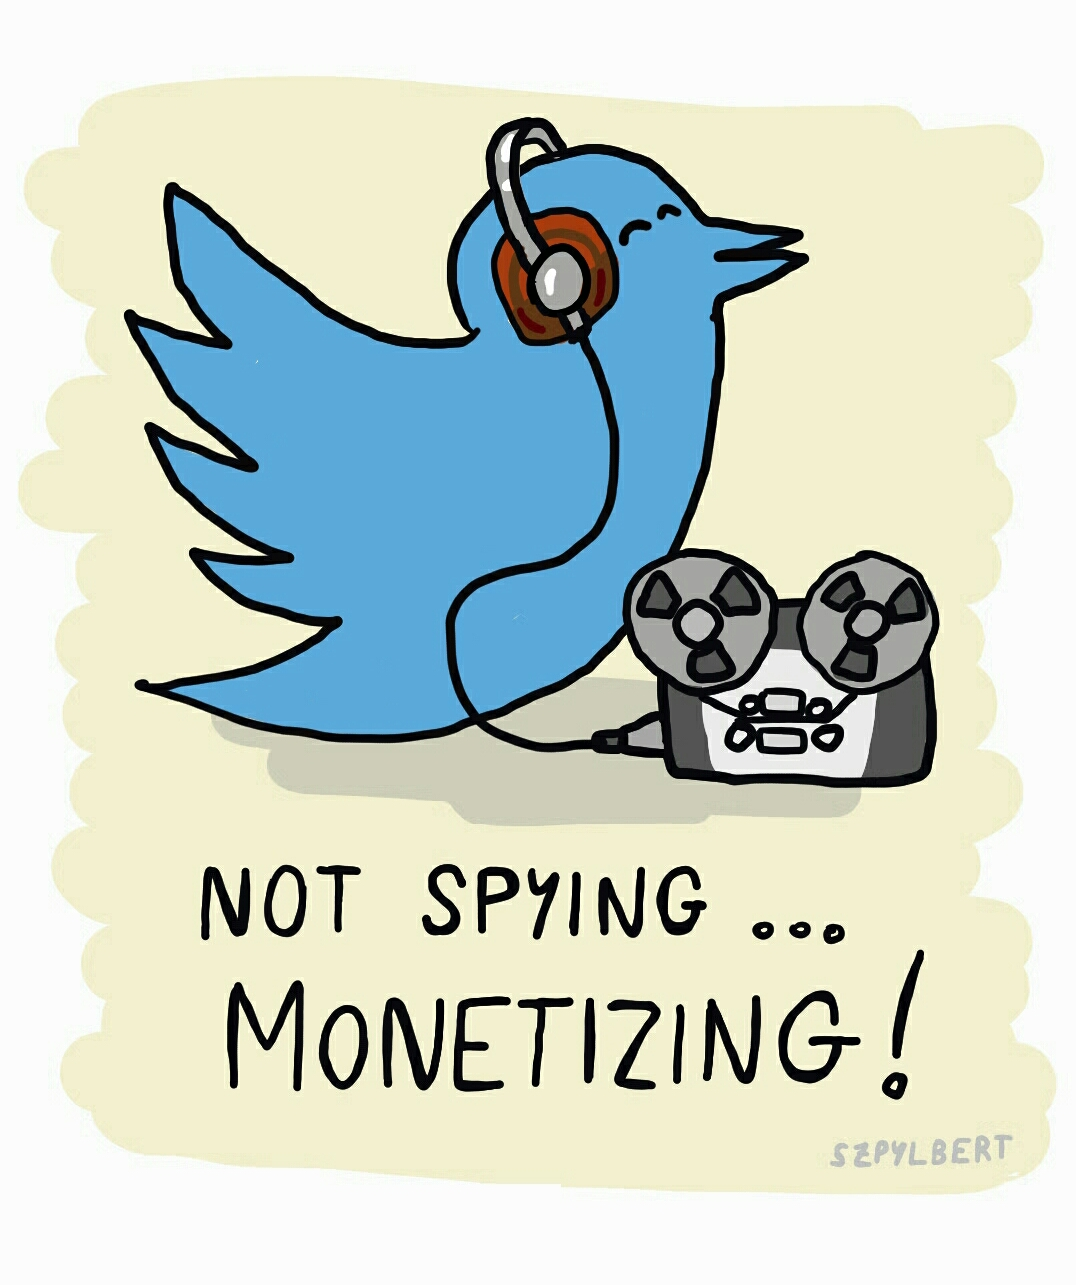 Szpylbert cartoon about Twitter 's spying